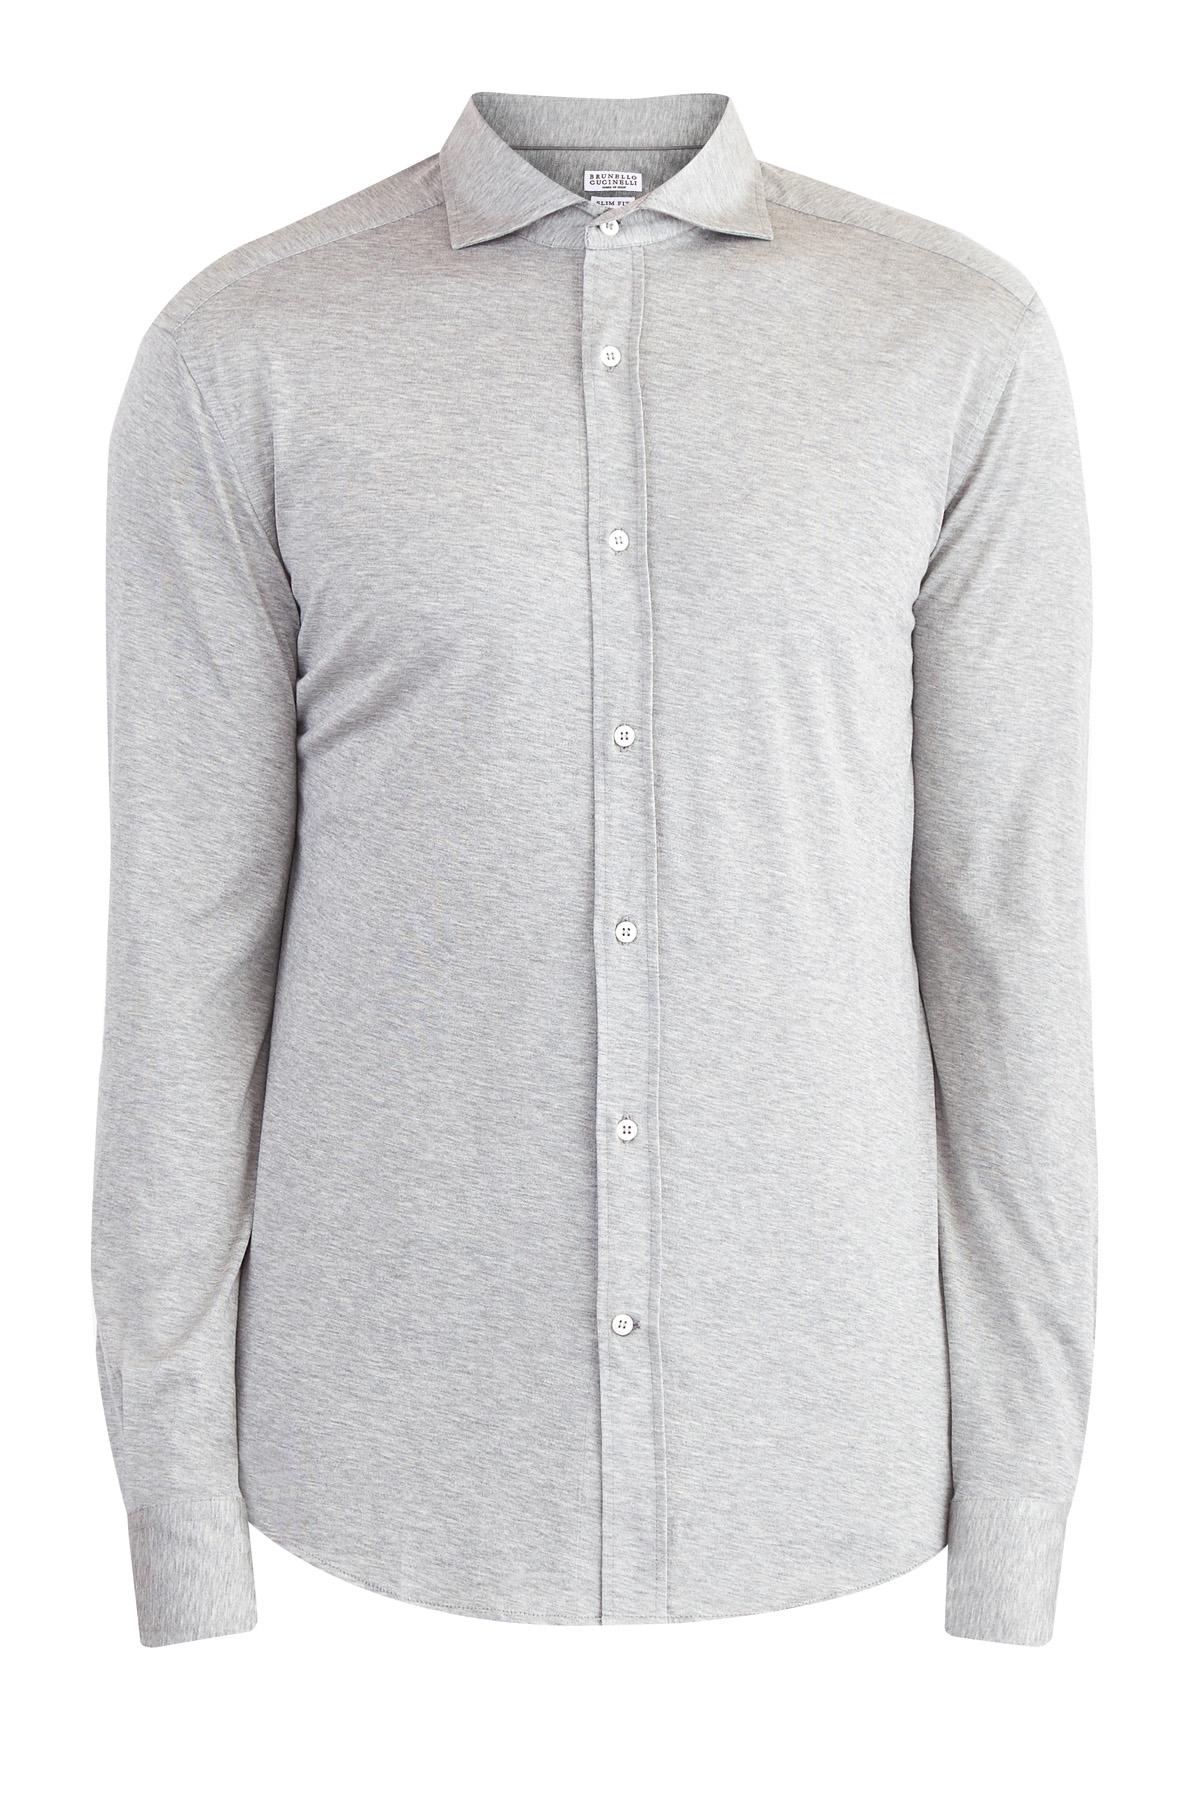 Рубашка из мягкого хлопкового джерси  сером меланжевом тоне